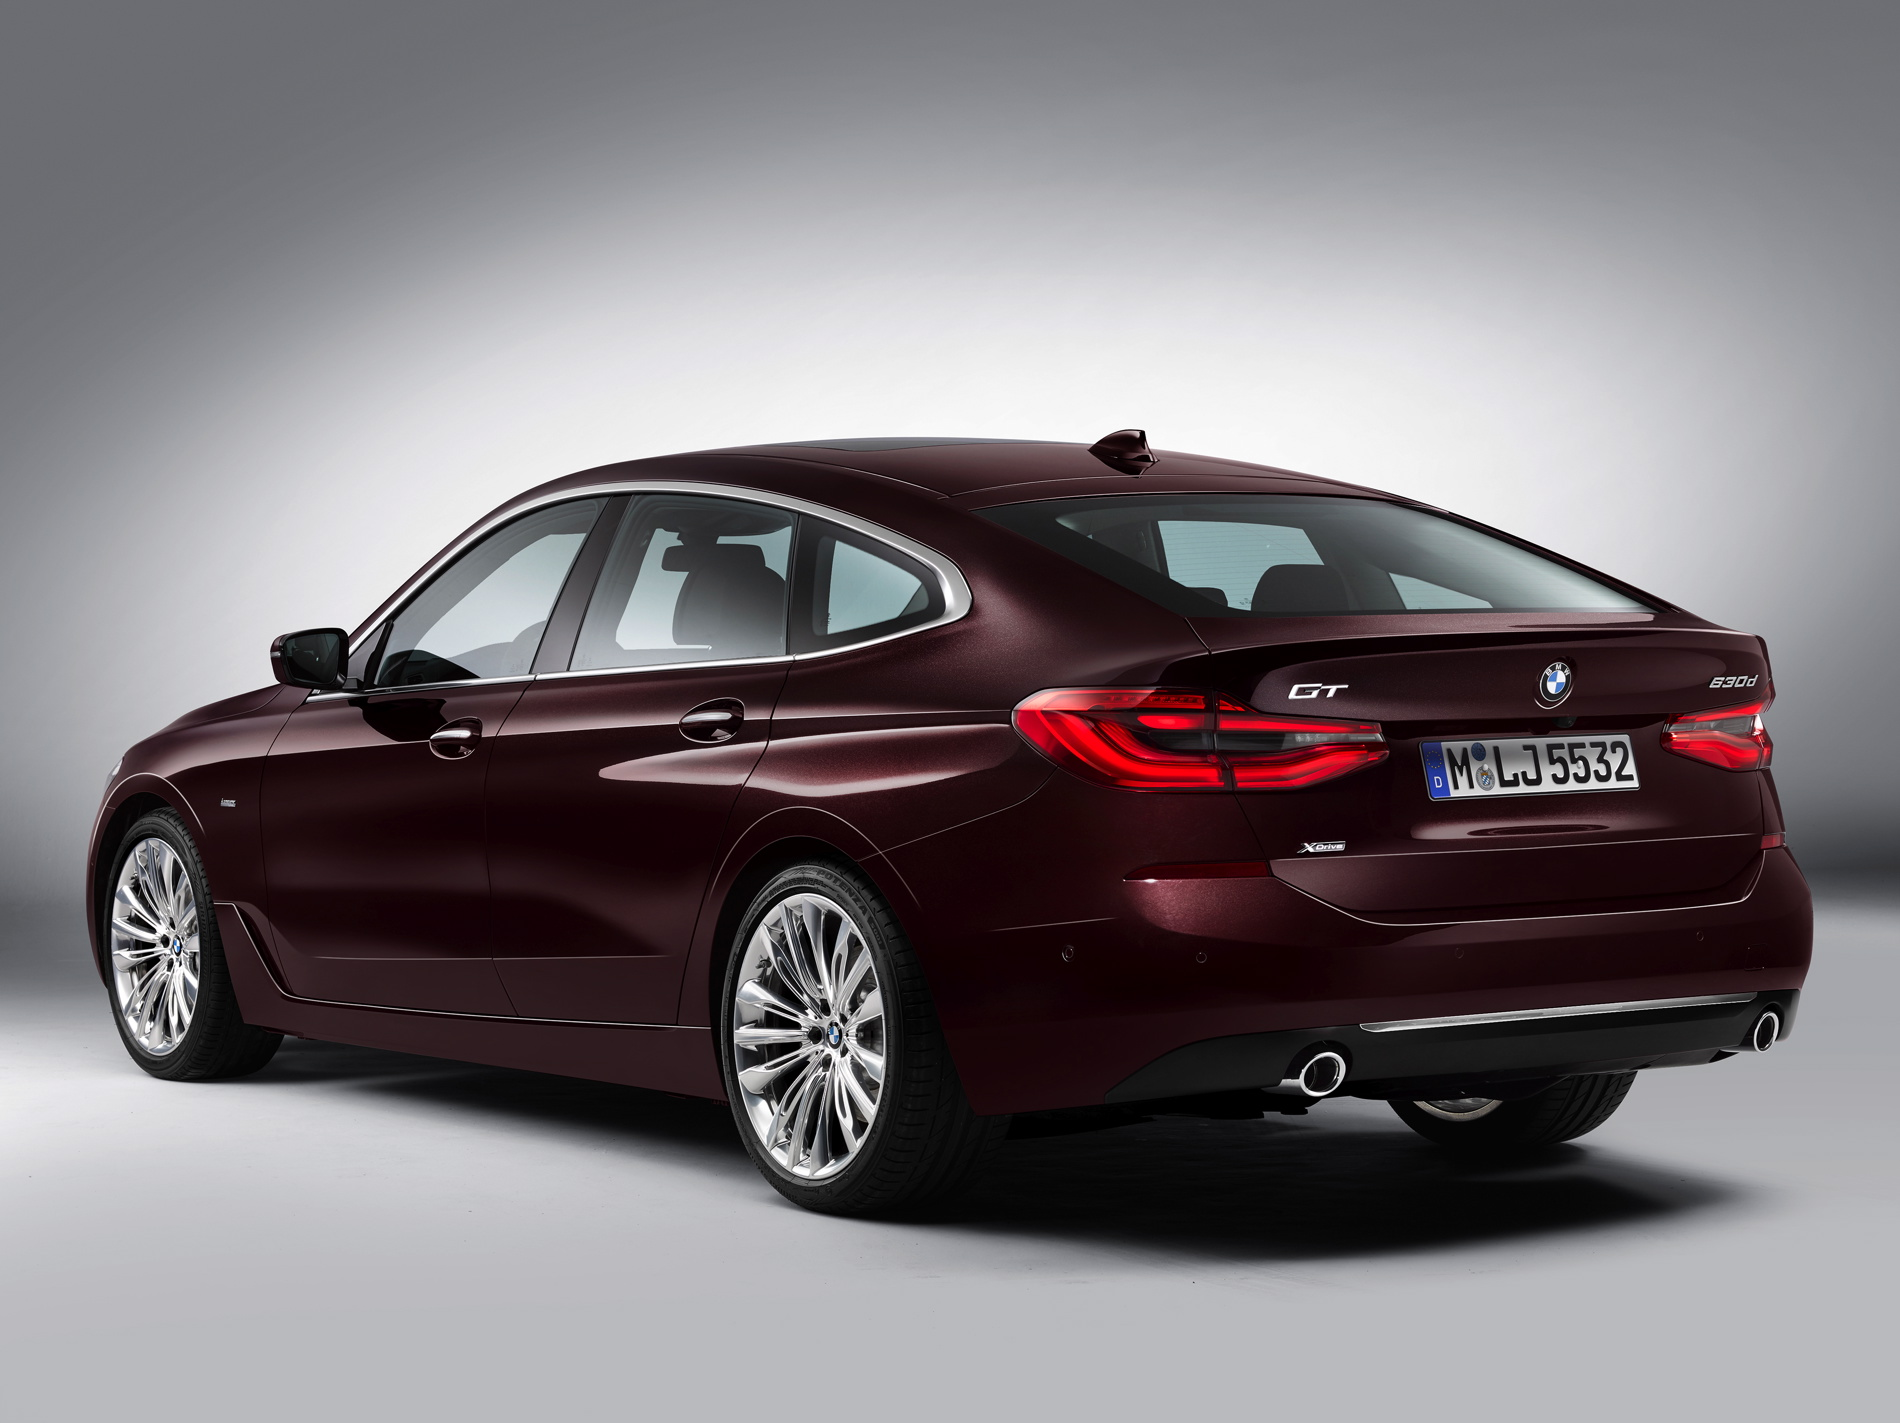 New BMW 6 Series Gran Turismo 24